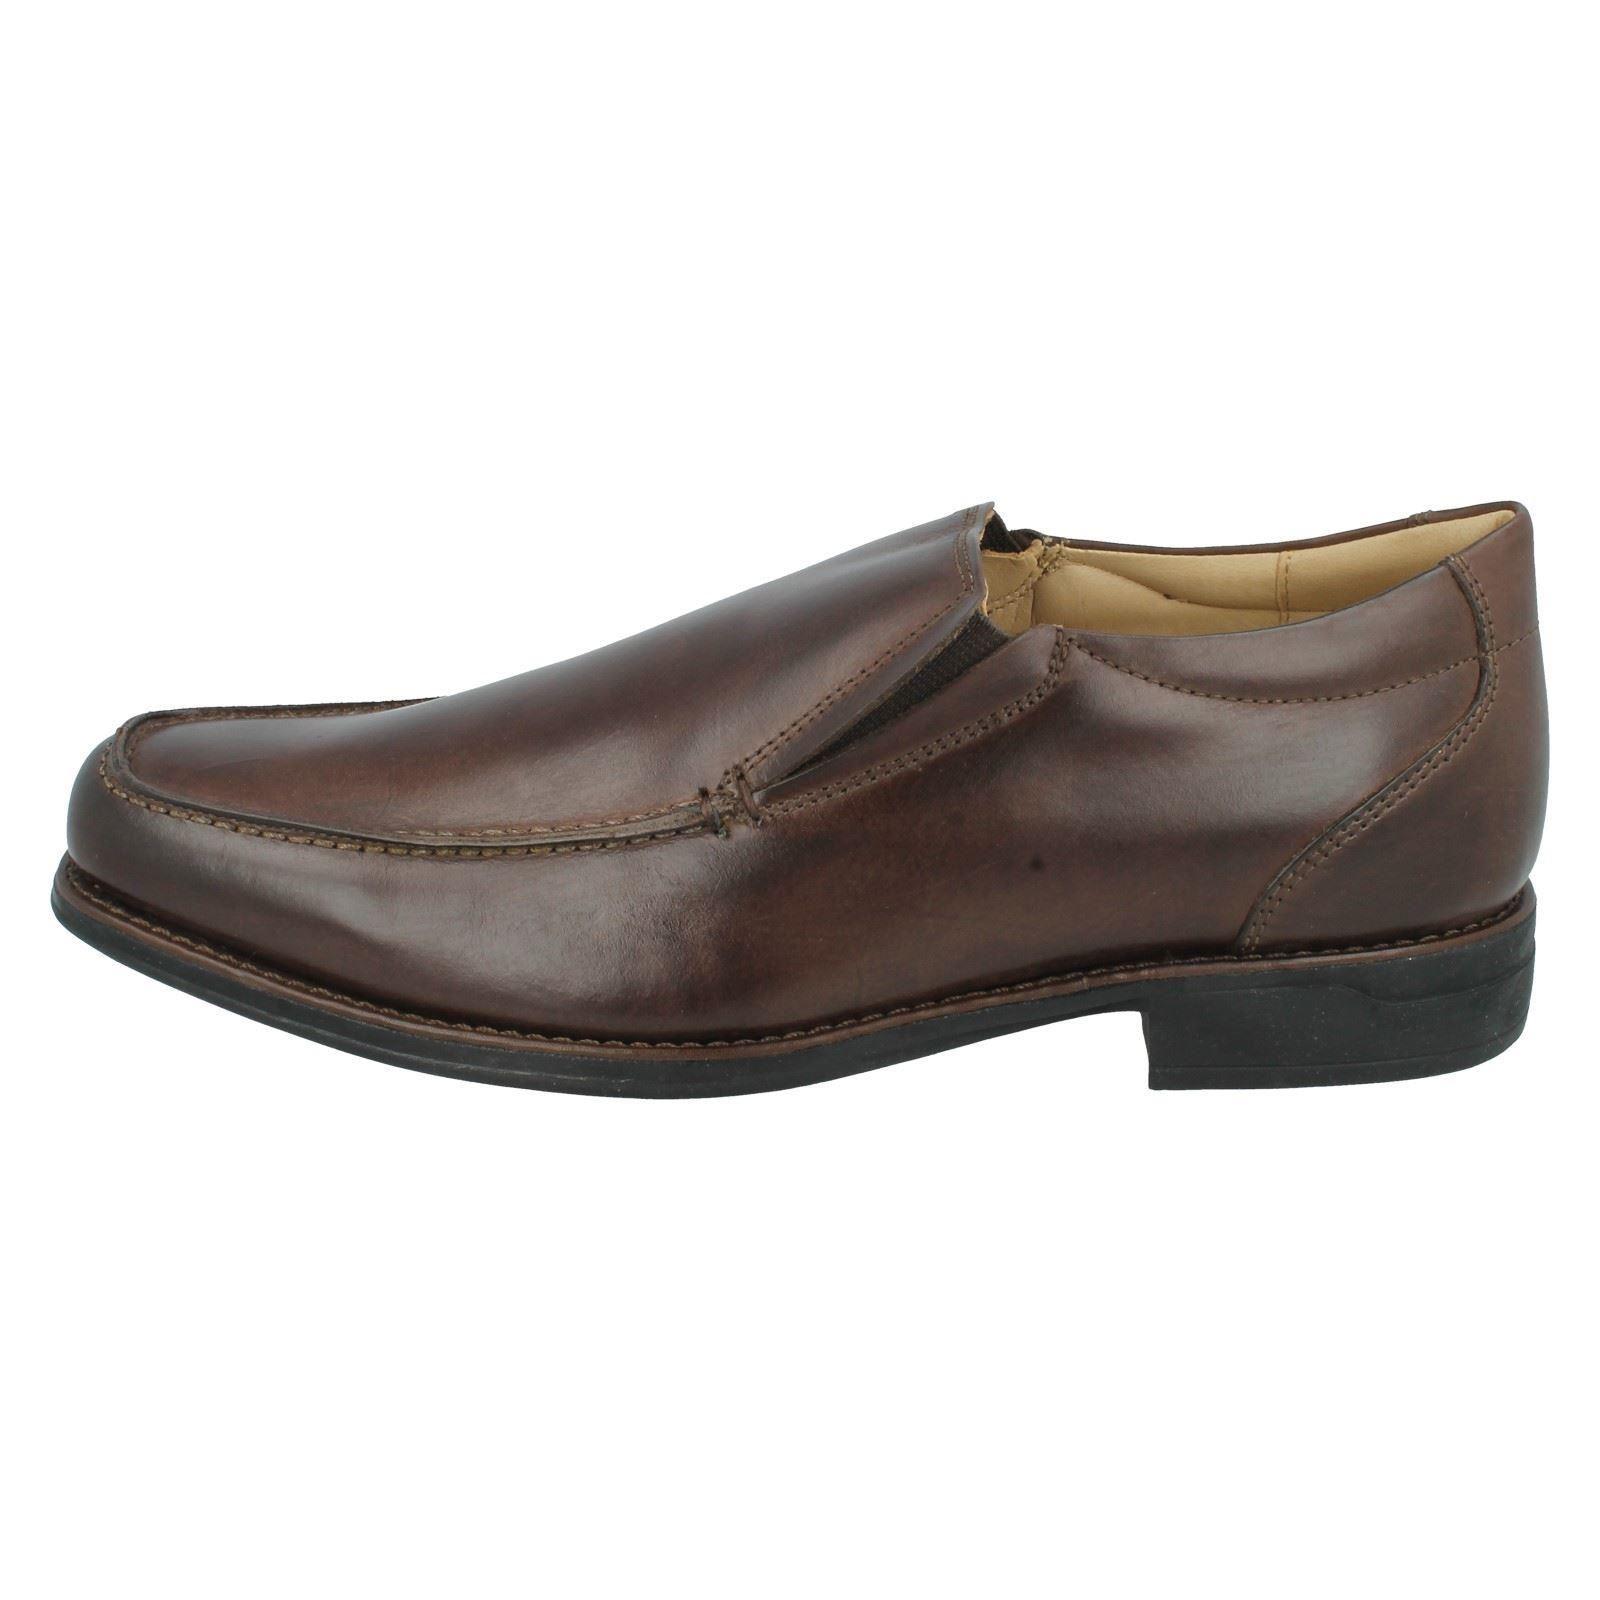 Mens Anatomic & Co 'Tapera' Smart Shoes Label ~ K K K 089854